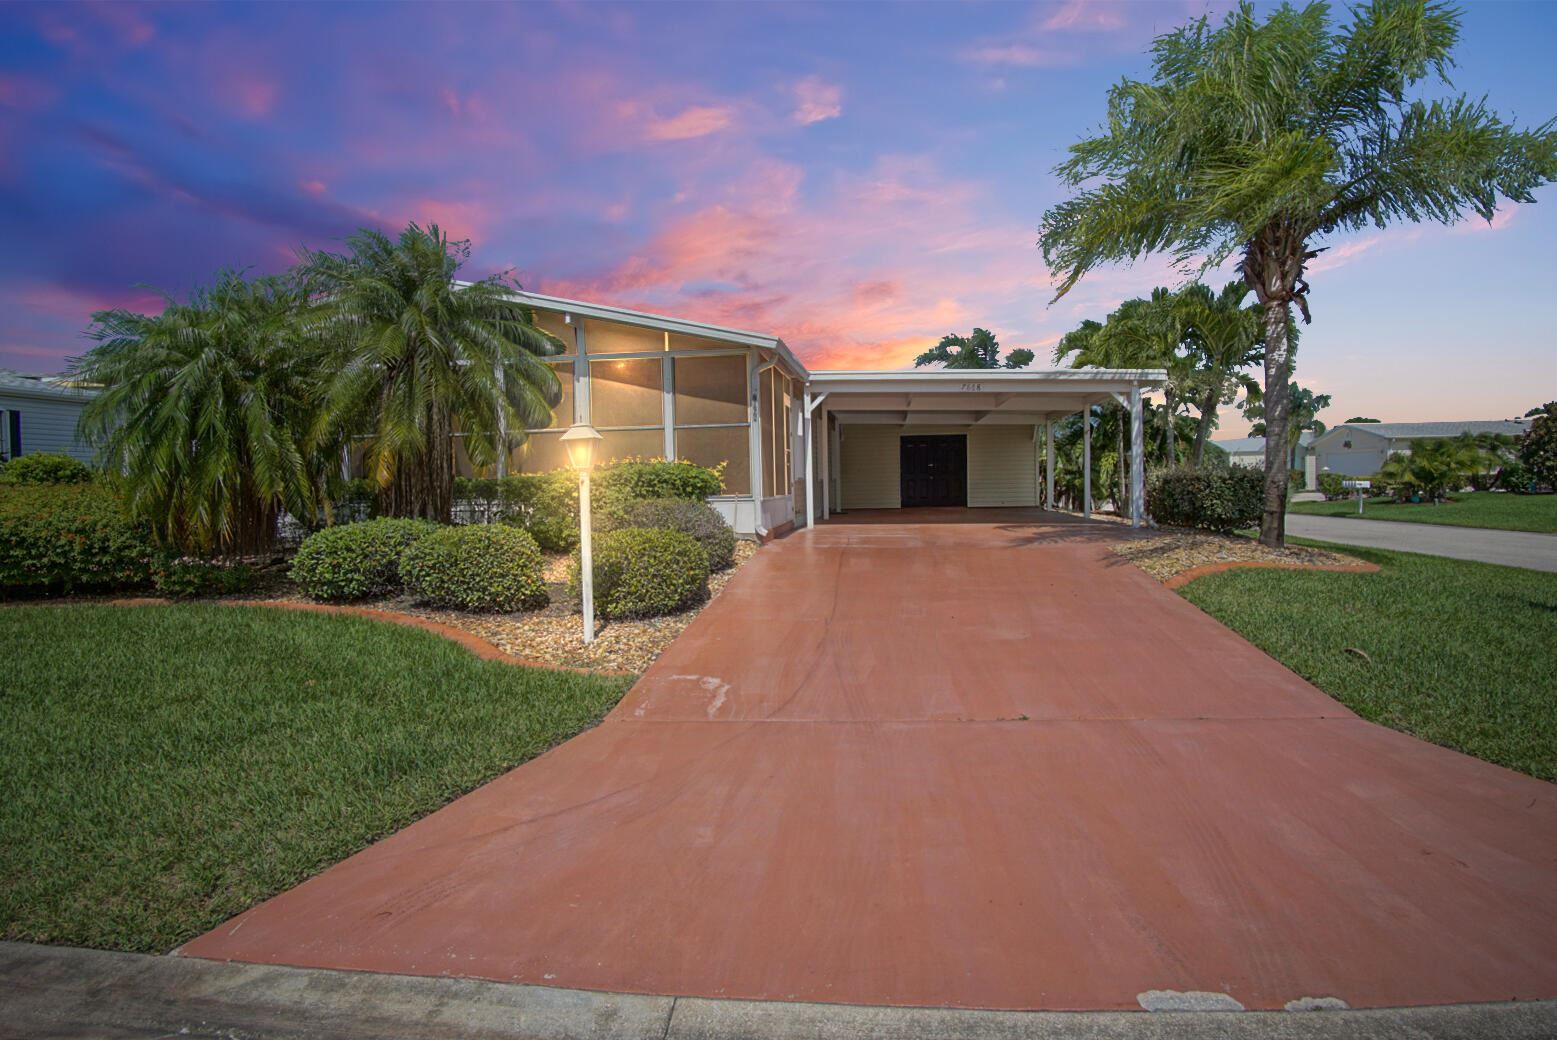 7868 Horned Lark Circle, Port Saint Lucie, FL 34952 - MLS#: RX-10726134